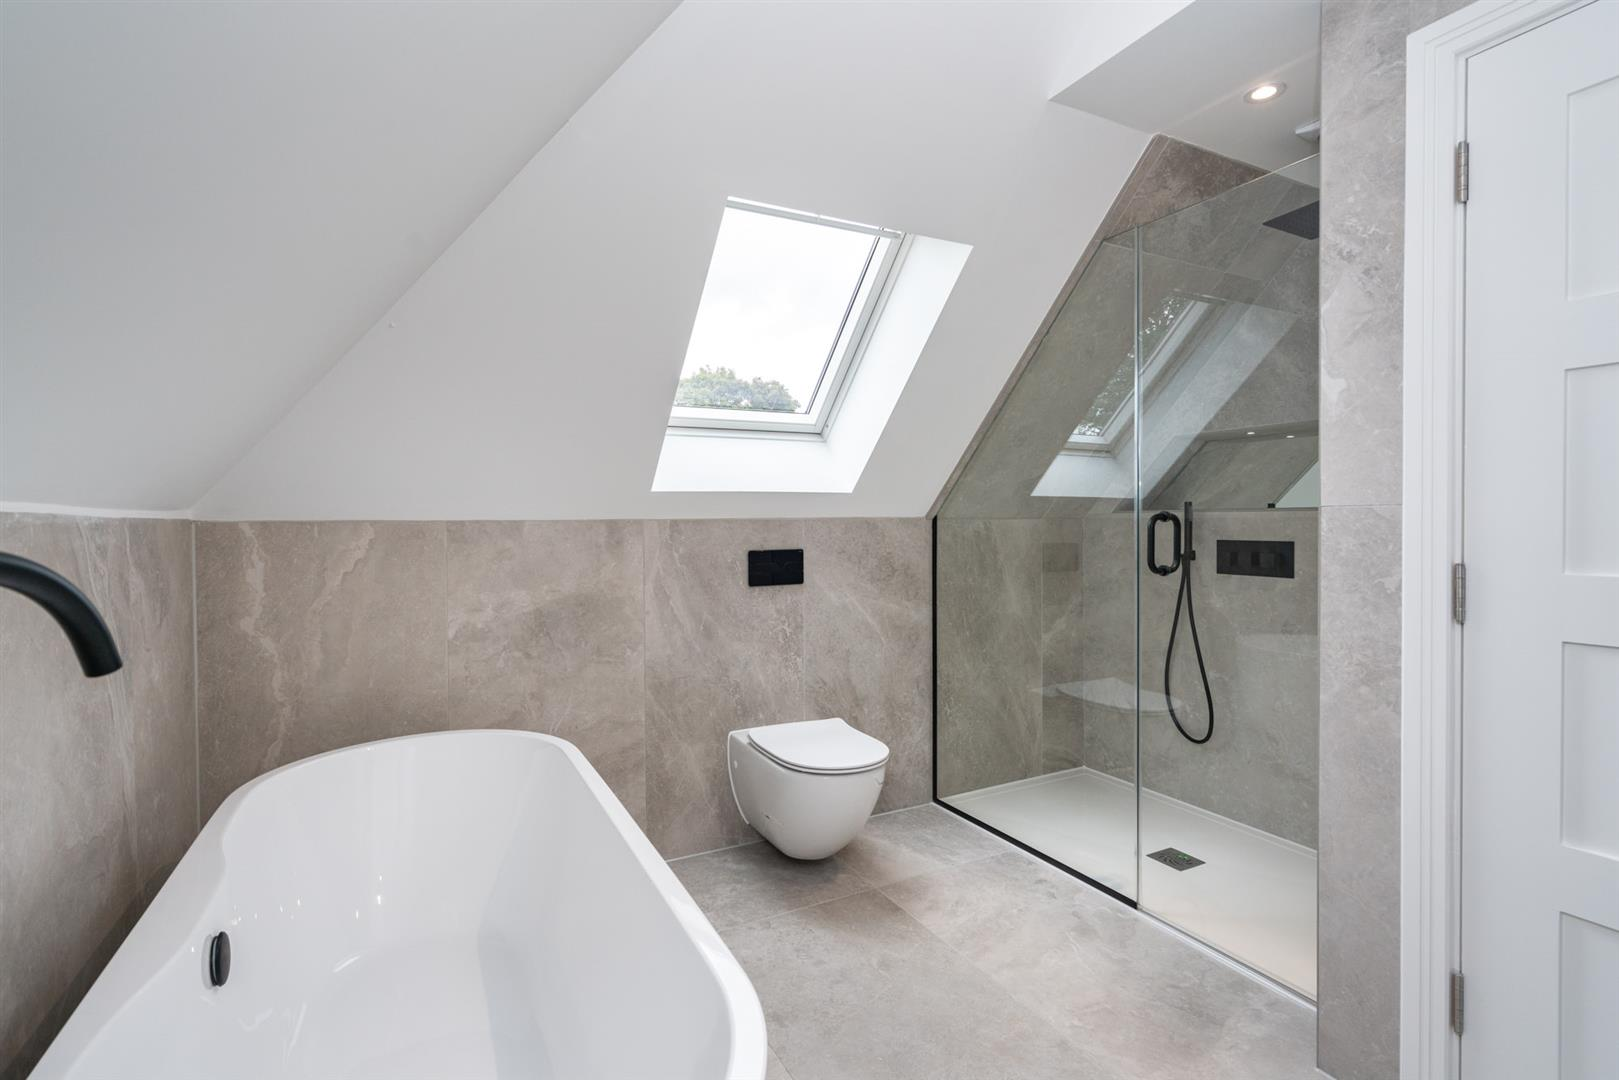 Hillcrest-3202- bathroom top room 1.jpg